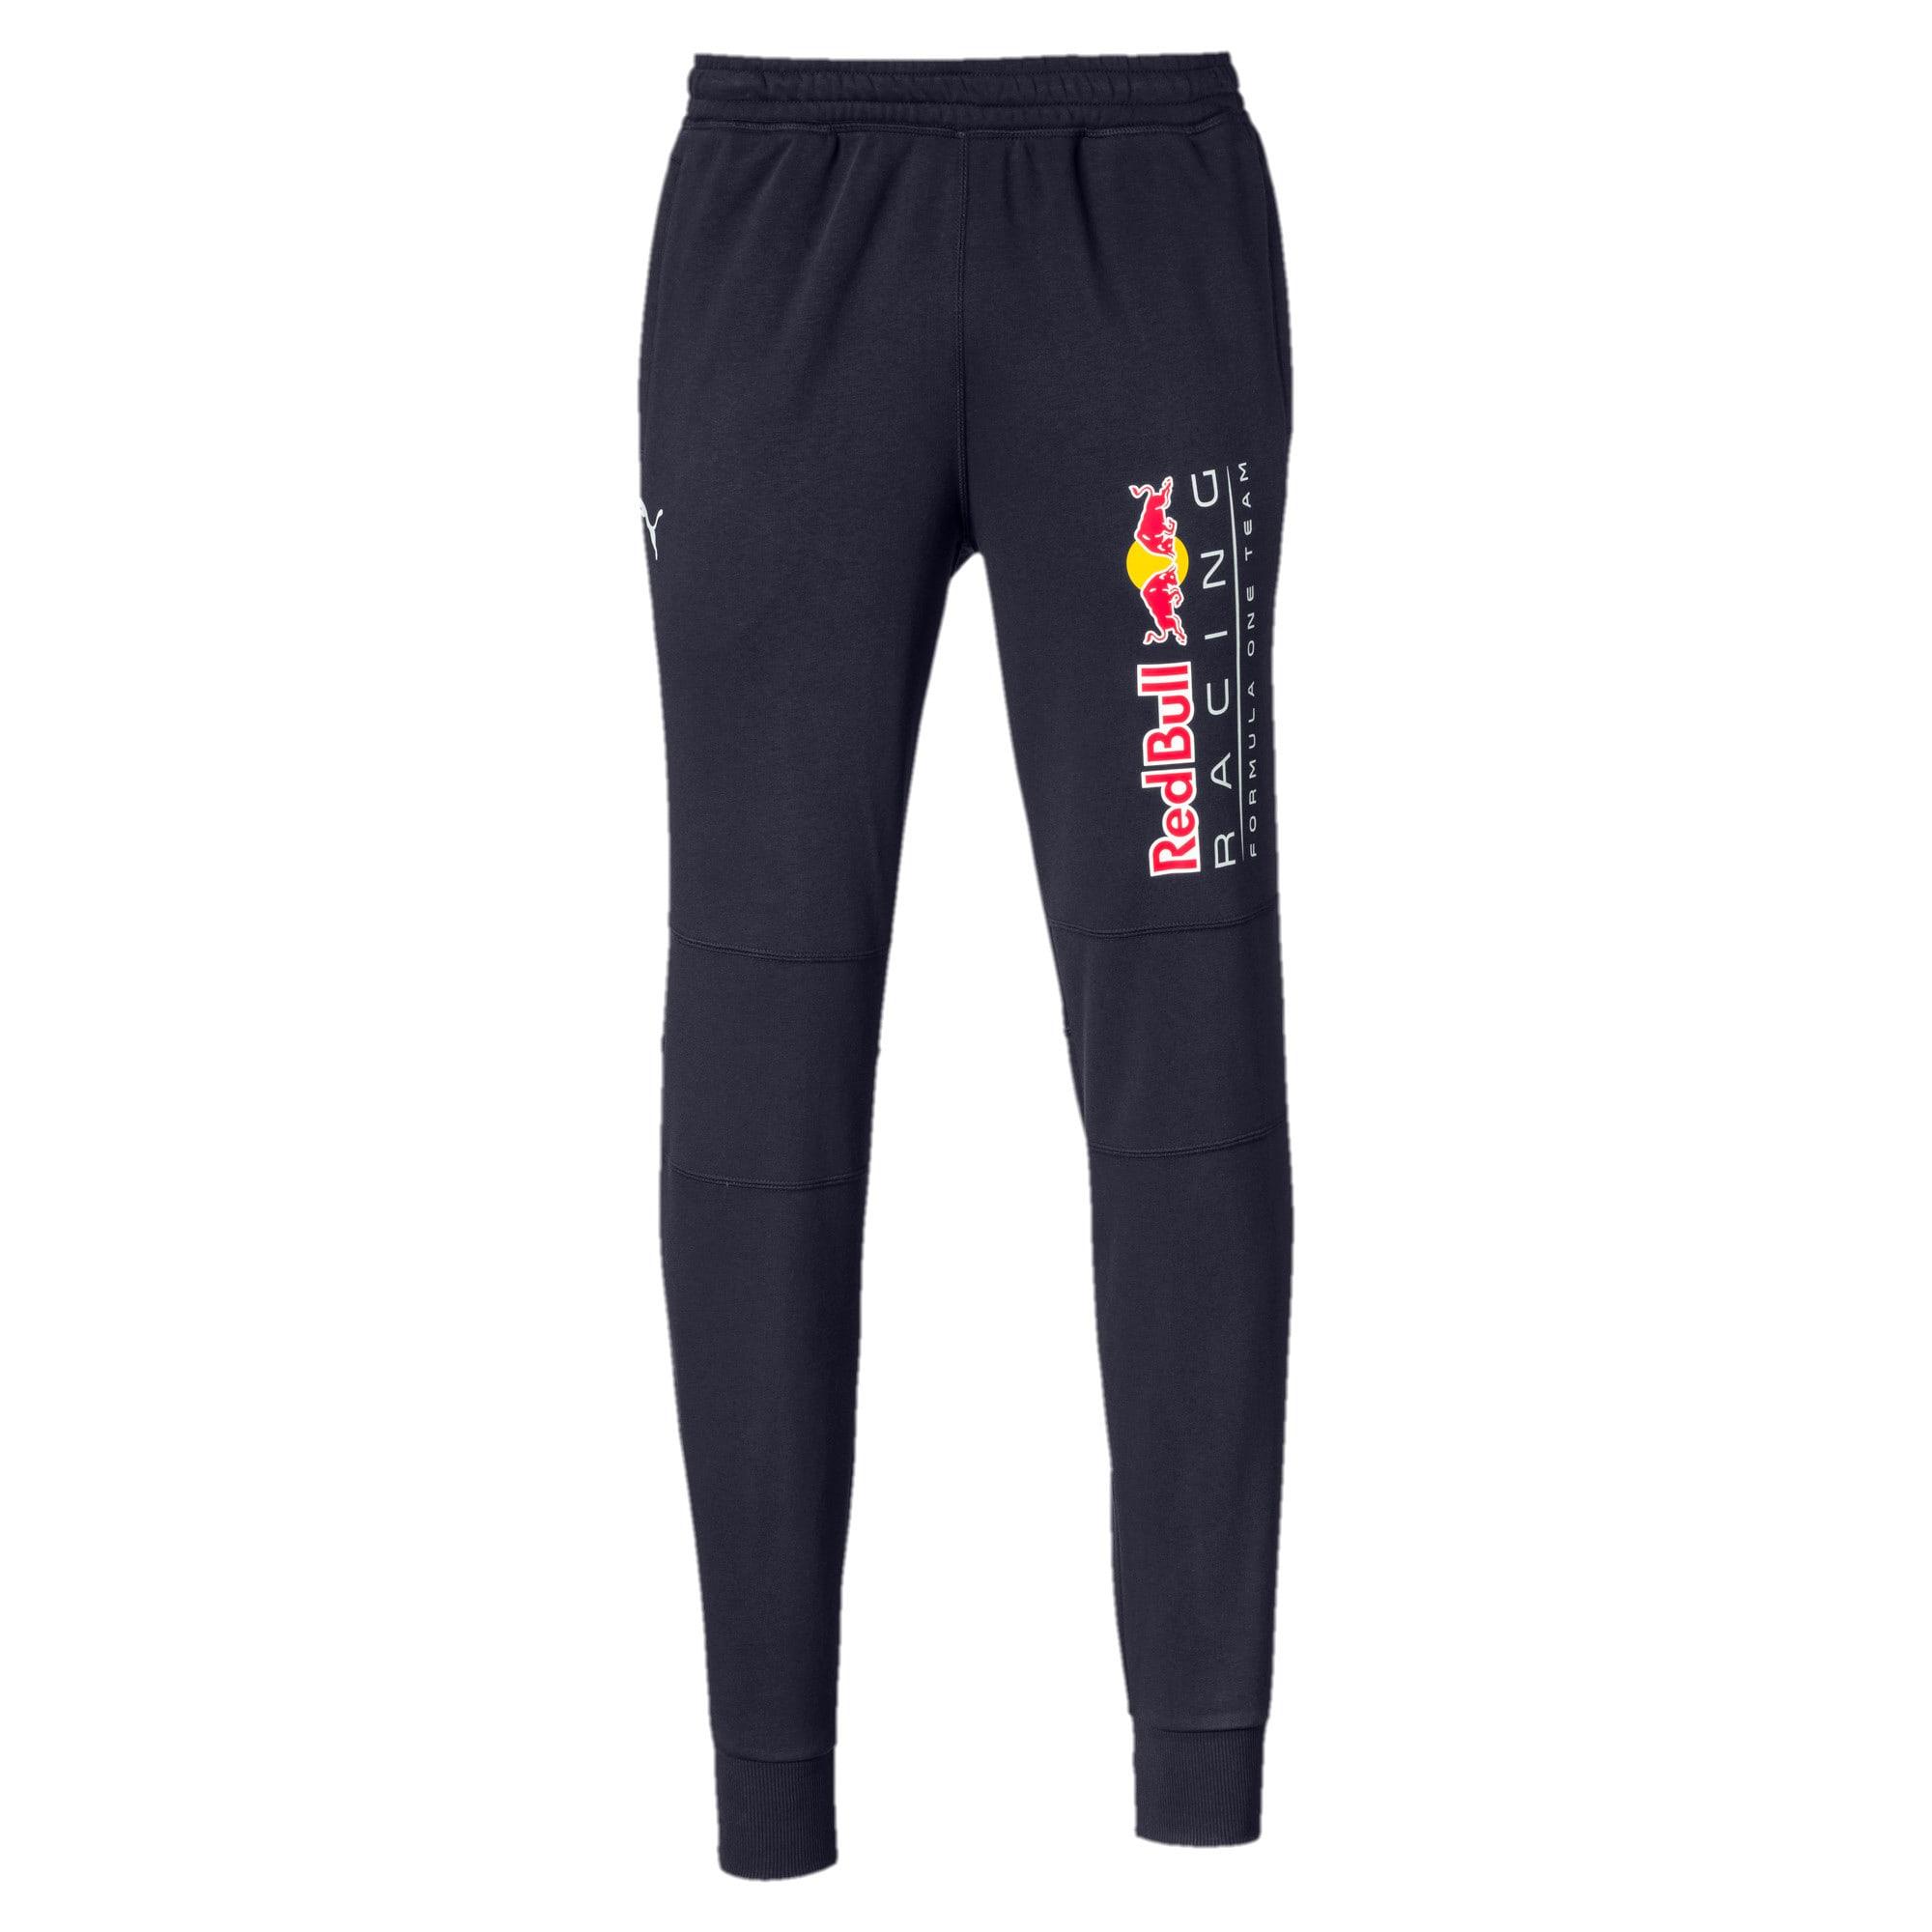 Thumbnail 4 of Red Bull Racing Knitted Men's Sweat Pants, NIGHT SKY, medium